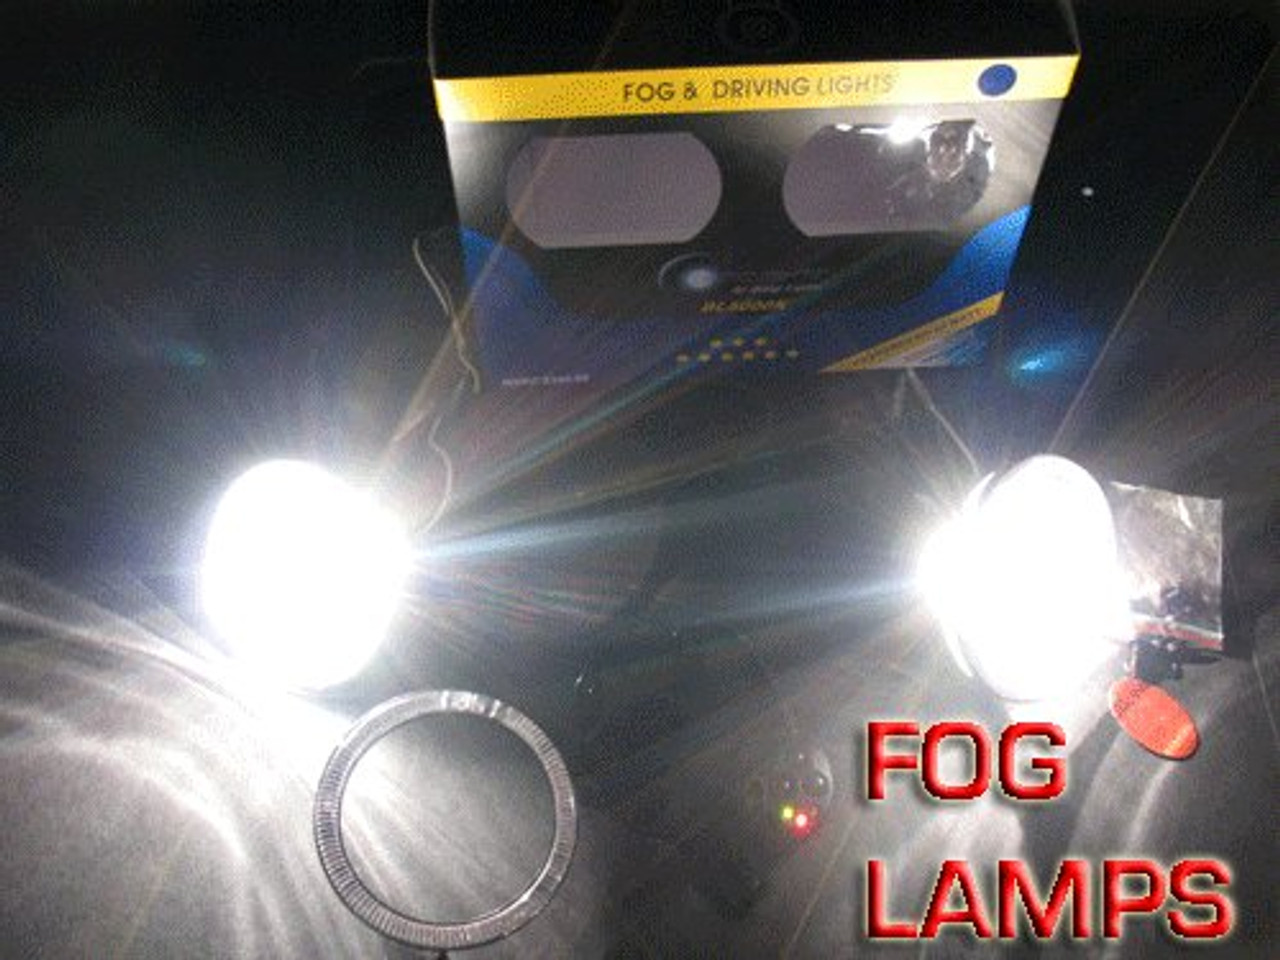 2001-2008 KIA MAGENTIS GS FOG LIGHTS LAMP ls 2002 2003 2004 2005 2006 2007